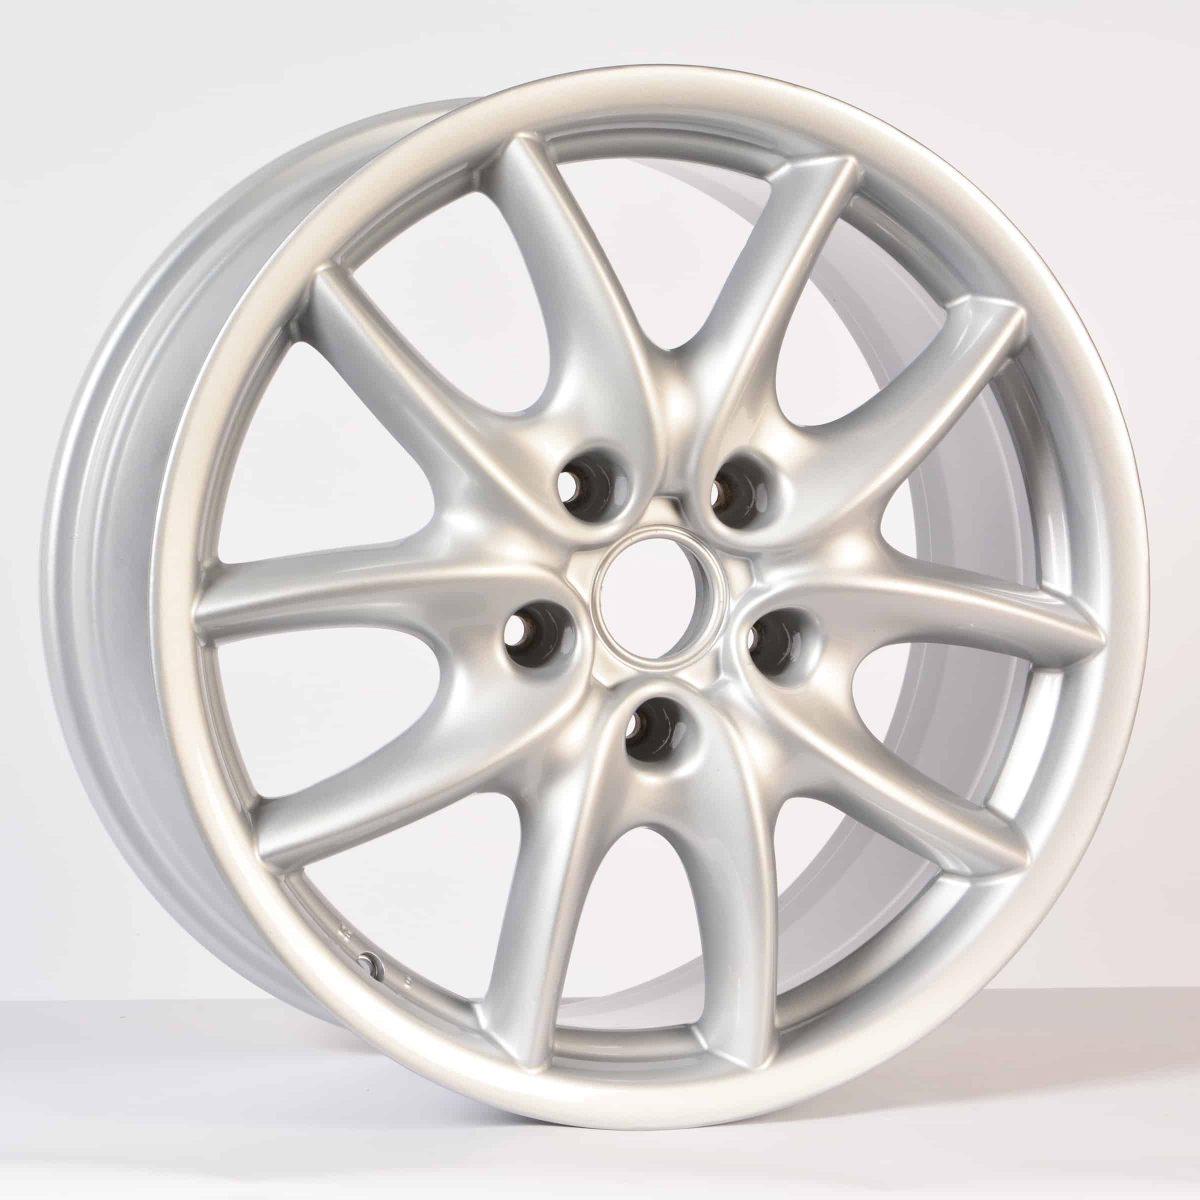 "Genuine Porsche Cayenne 955 957 Design Spoke 19"" inch Alloy Wheels with Silver Finish 715 601 025 B"